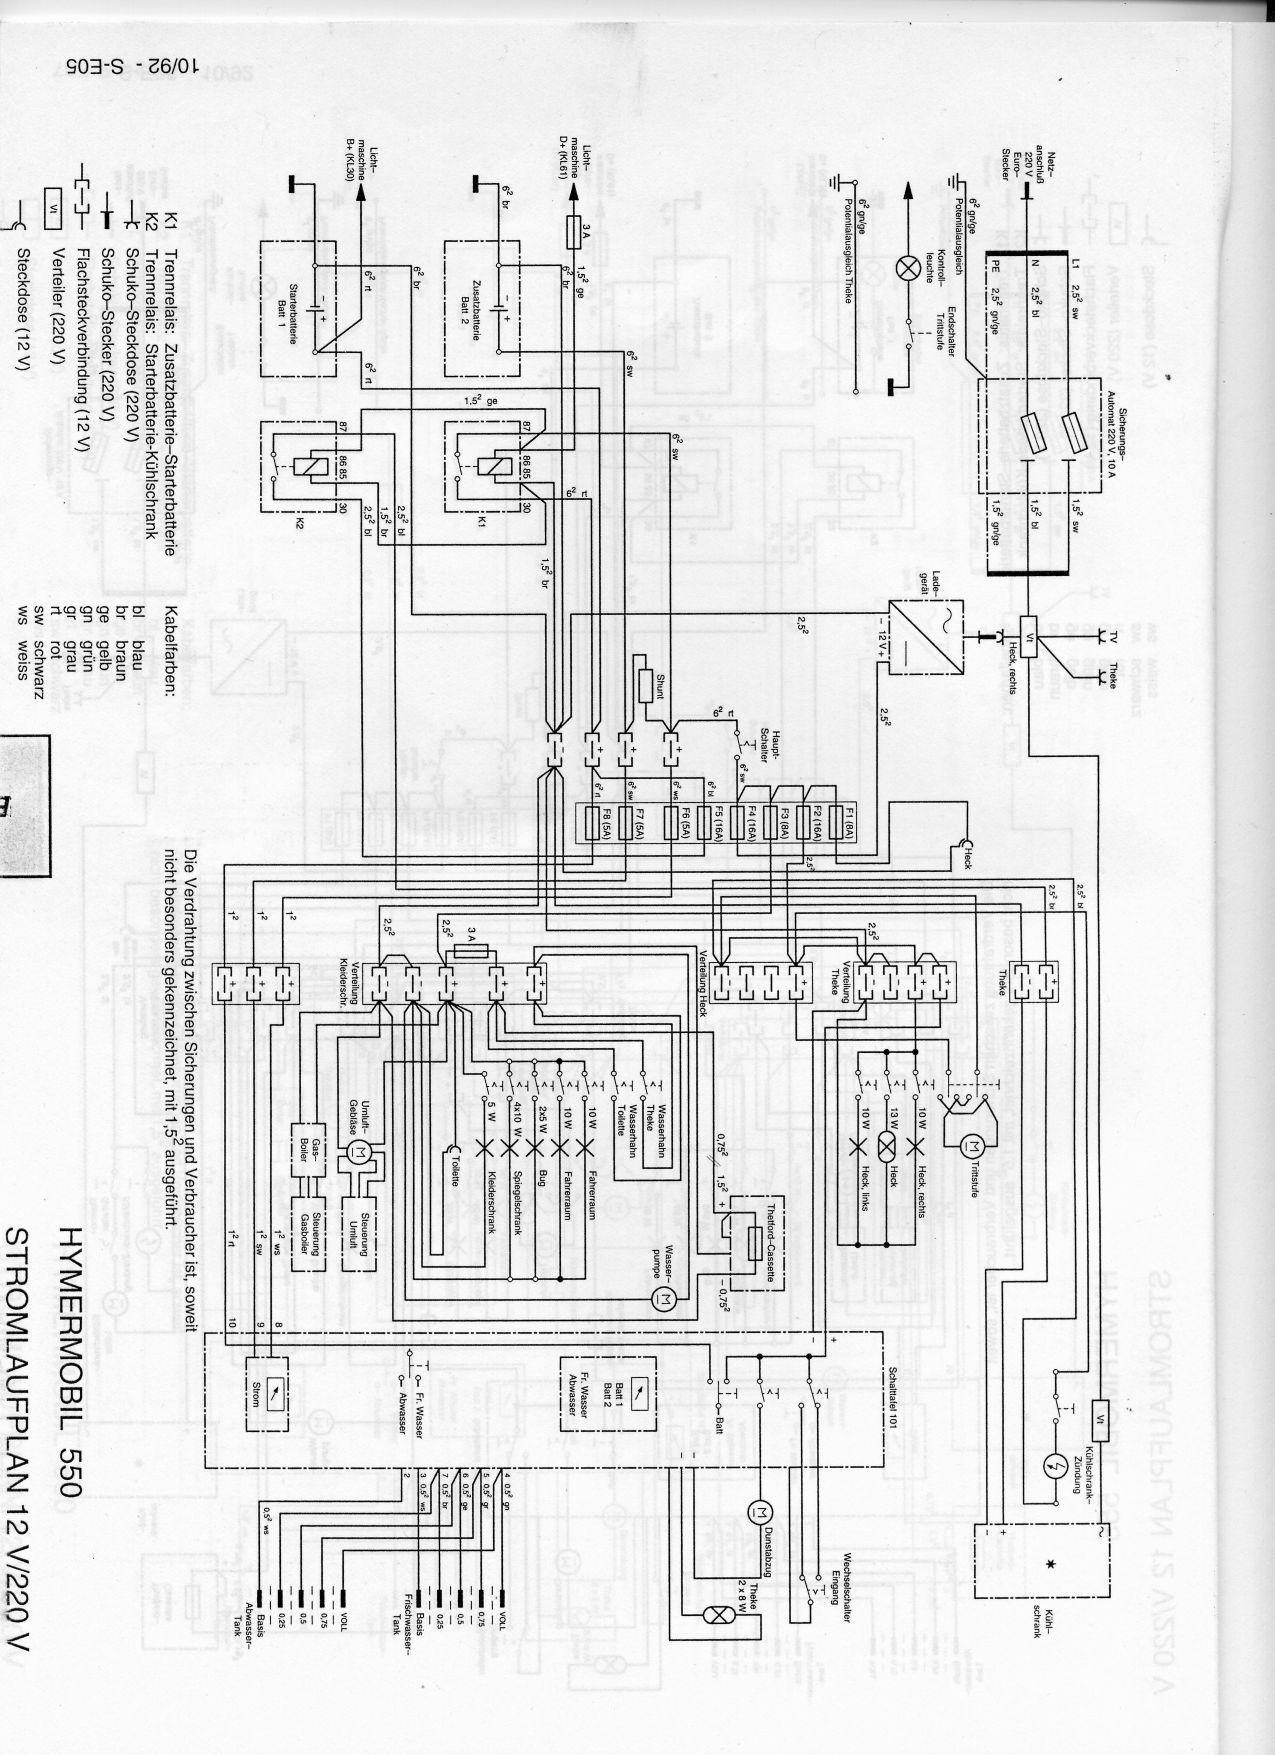 Stromlaufpläne